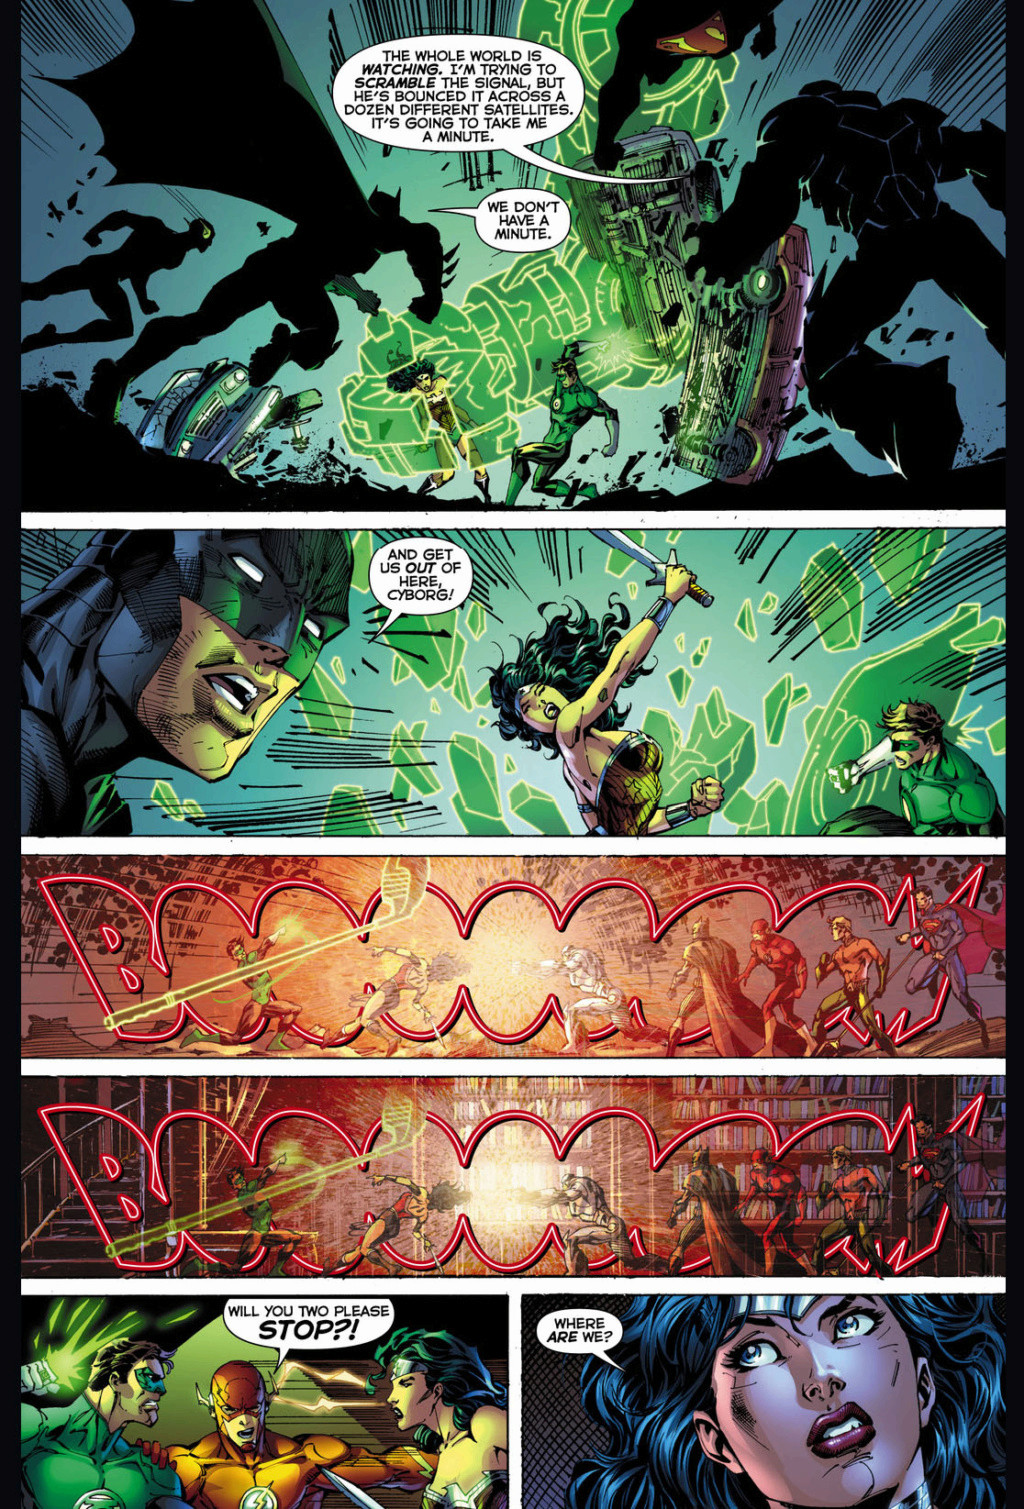 Mulher Maravilha vs Lanterna verde  Wonder10